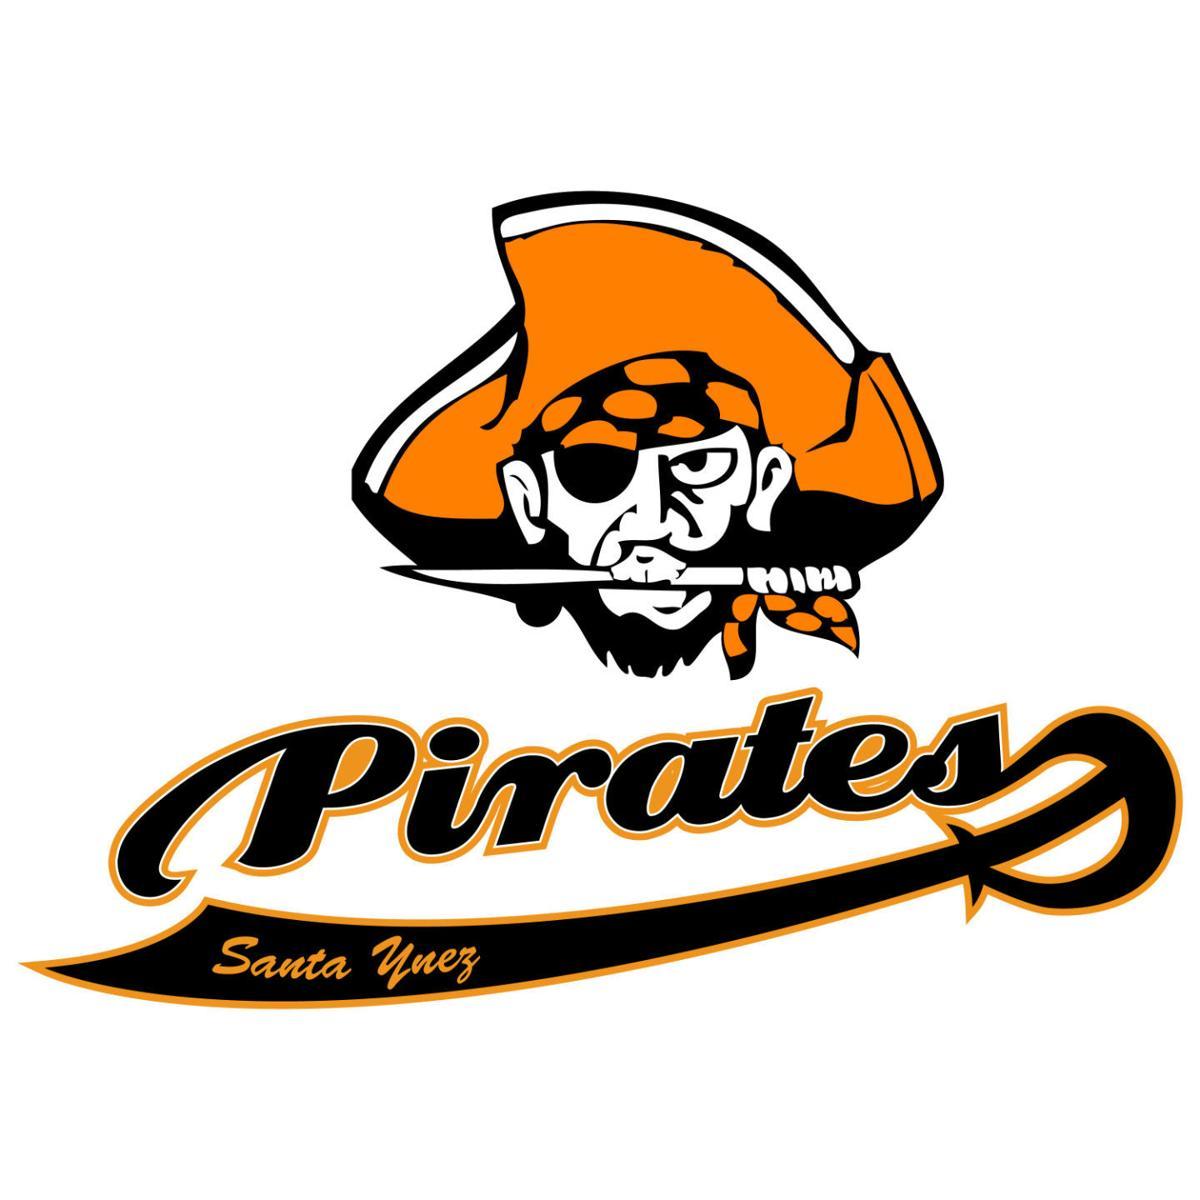 Santa Ynez large logo